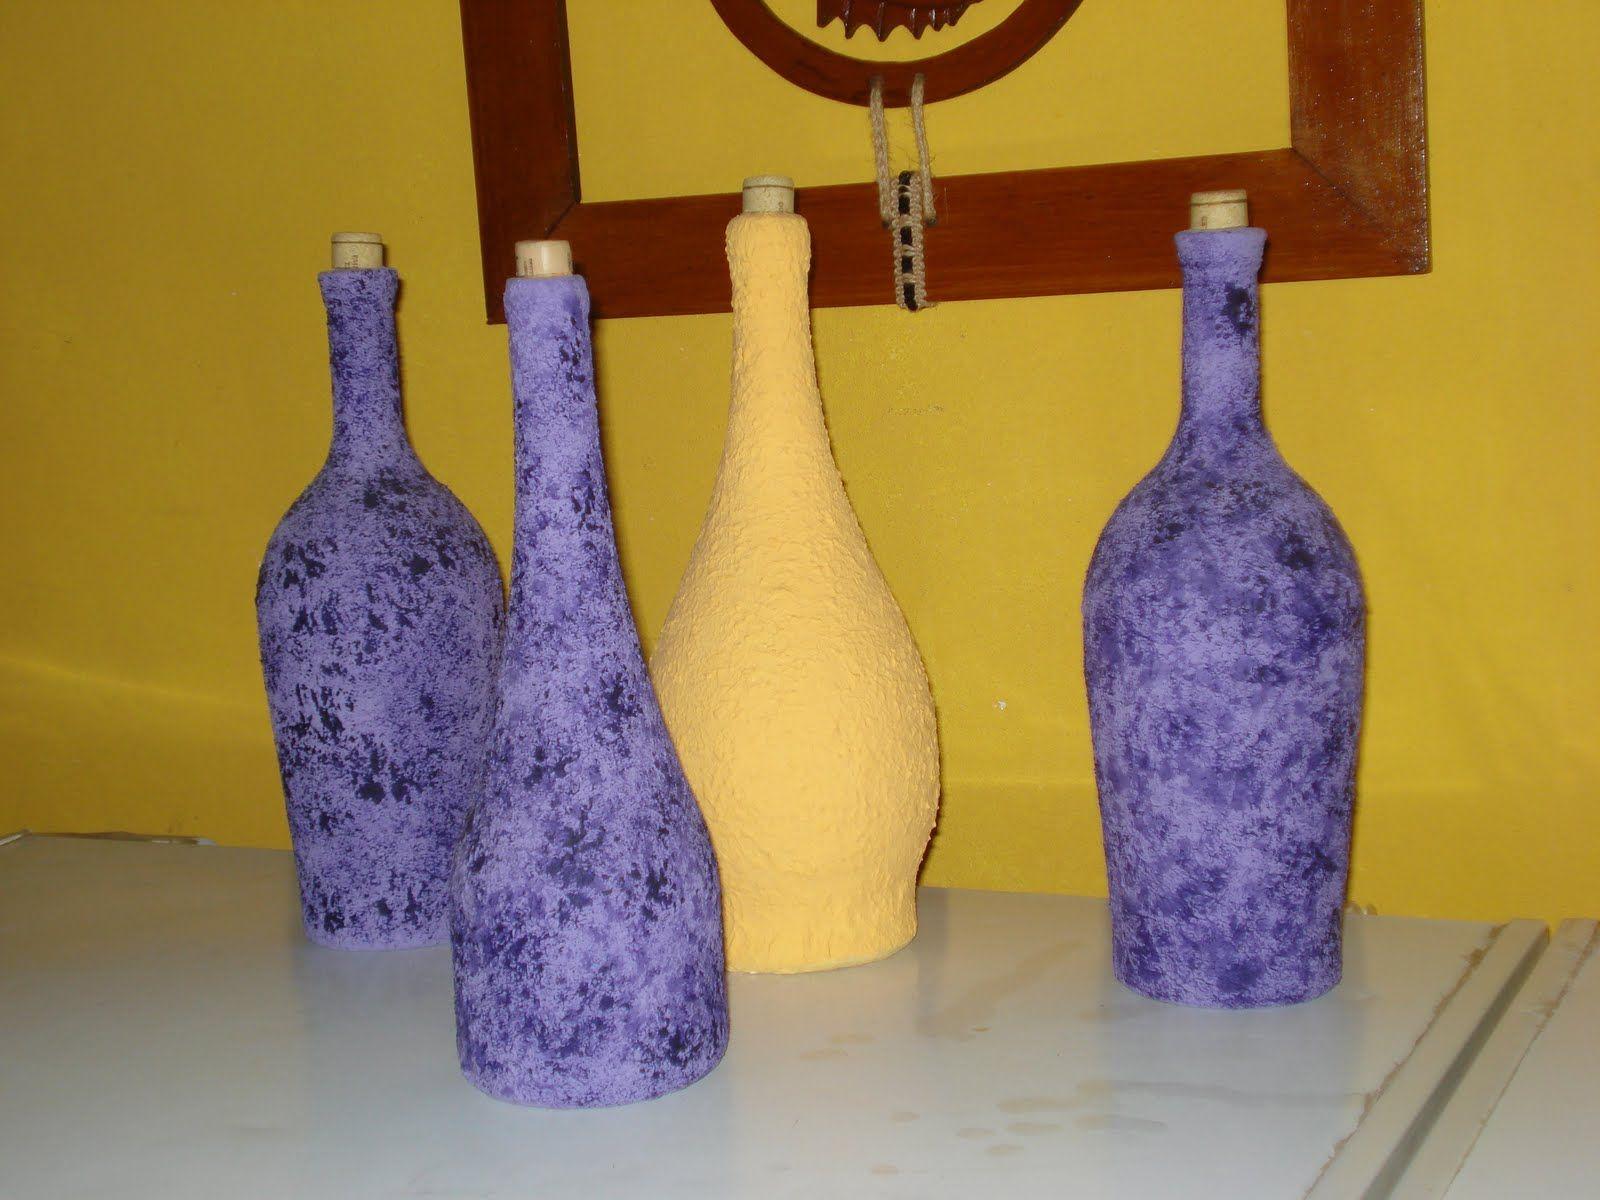 botellas de vidrio decoradas Buscar con Google